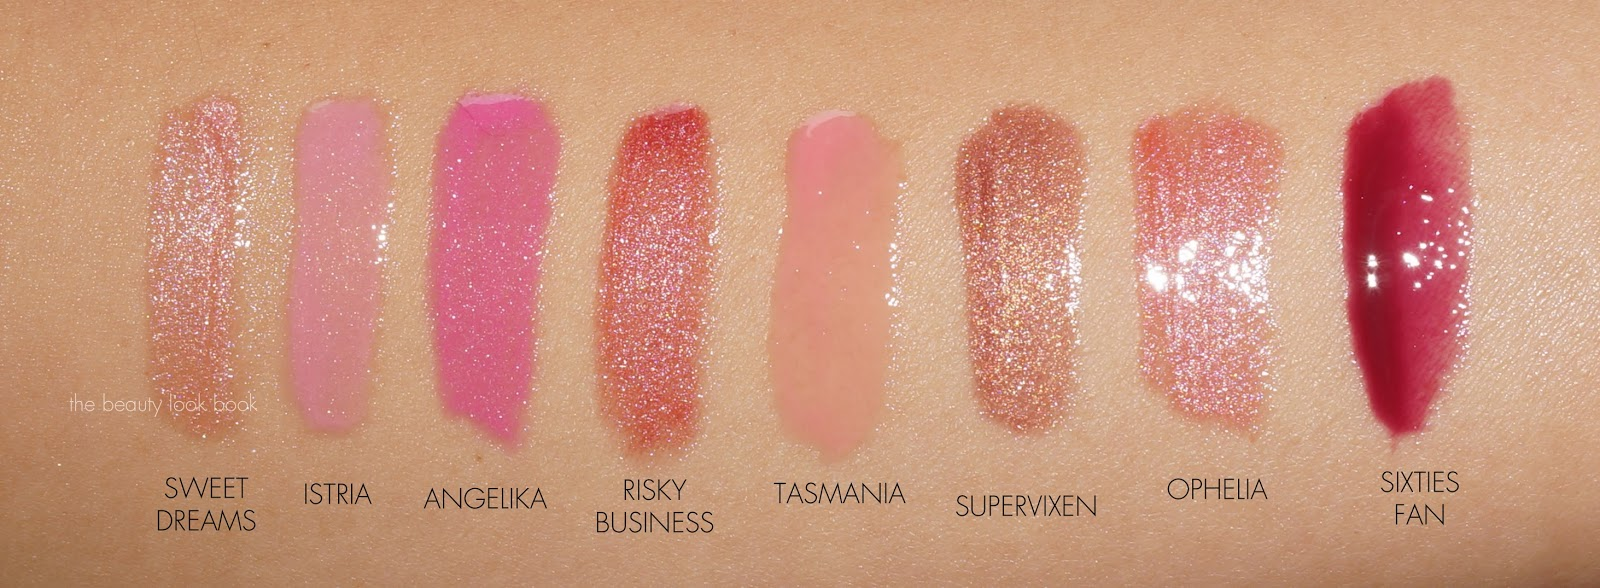 Burts Bees Lipstick Swatches